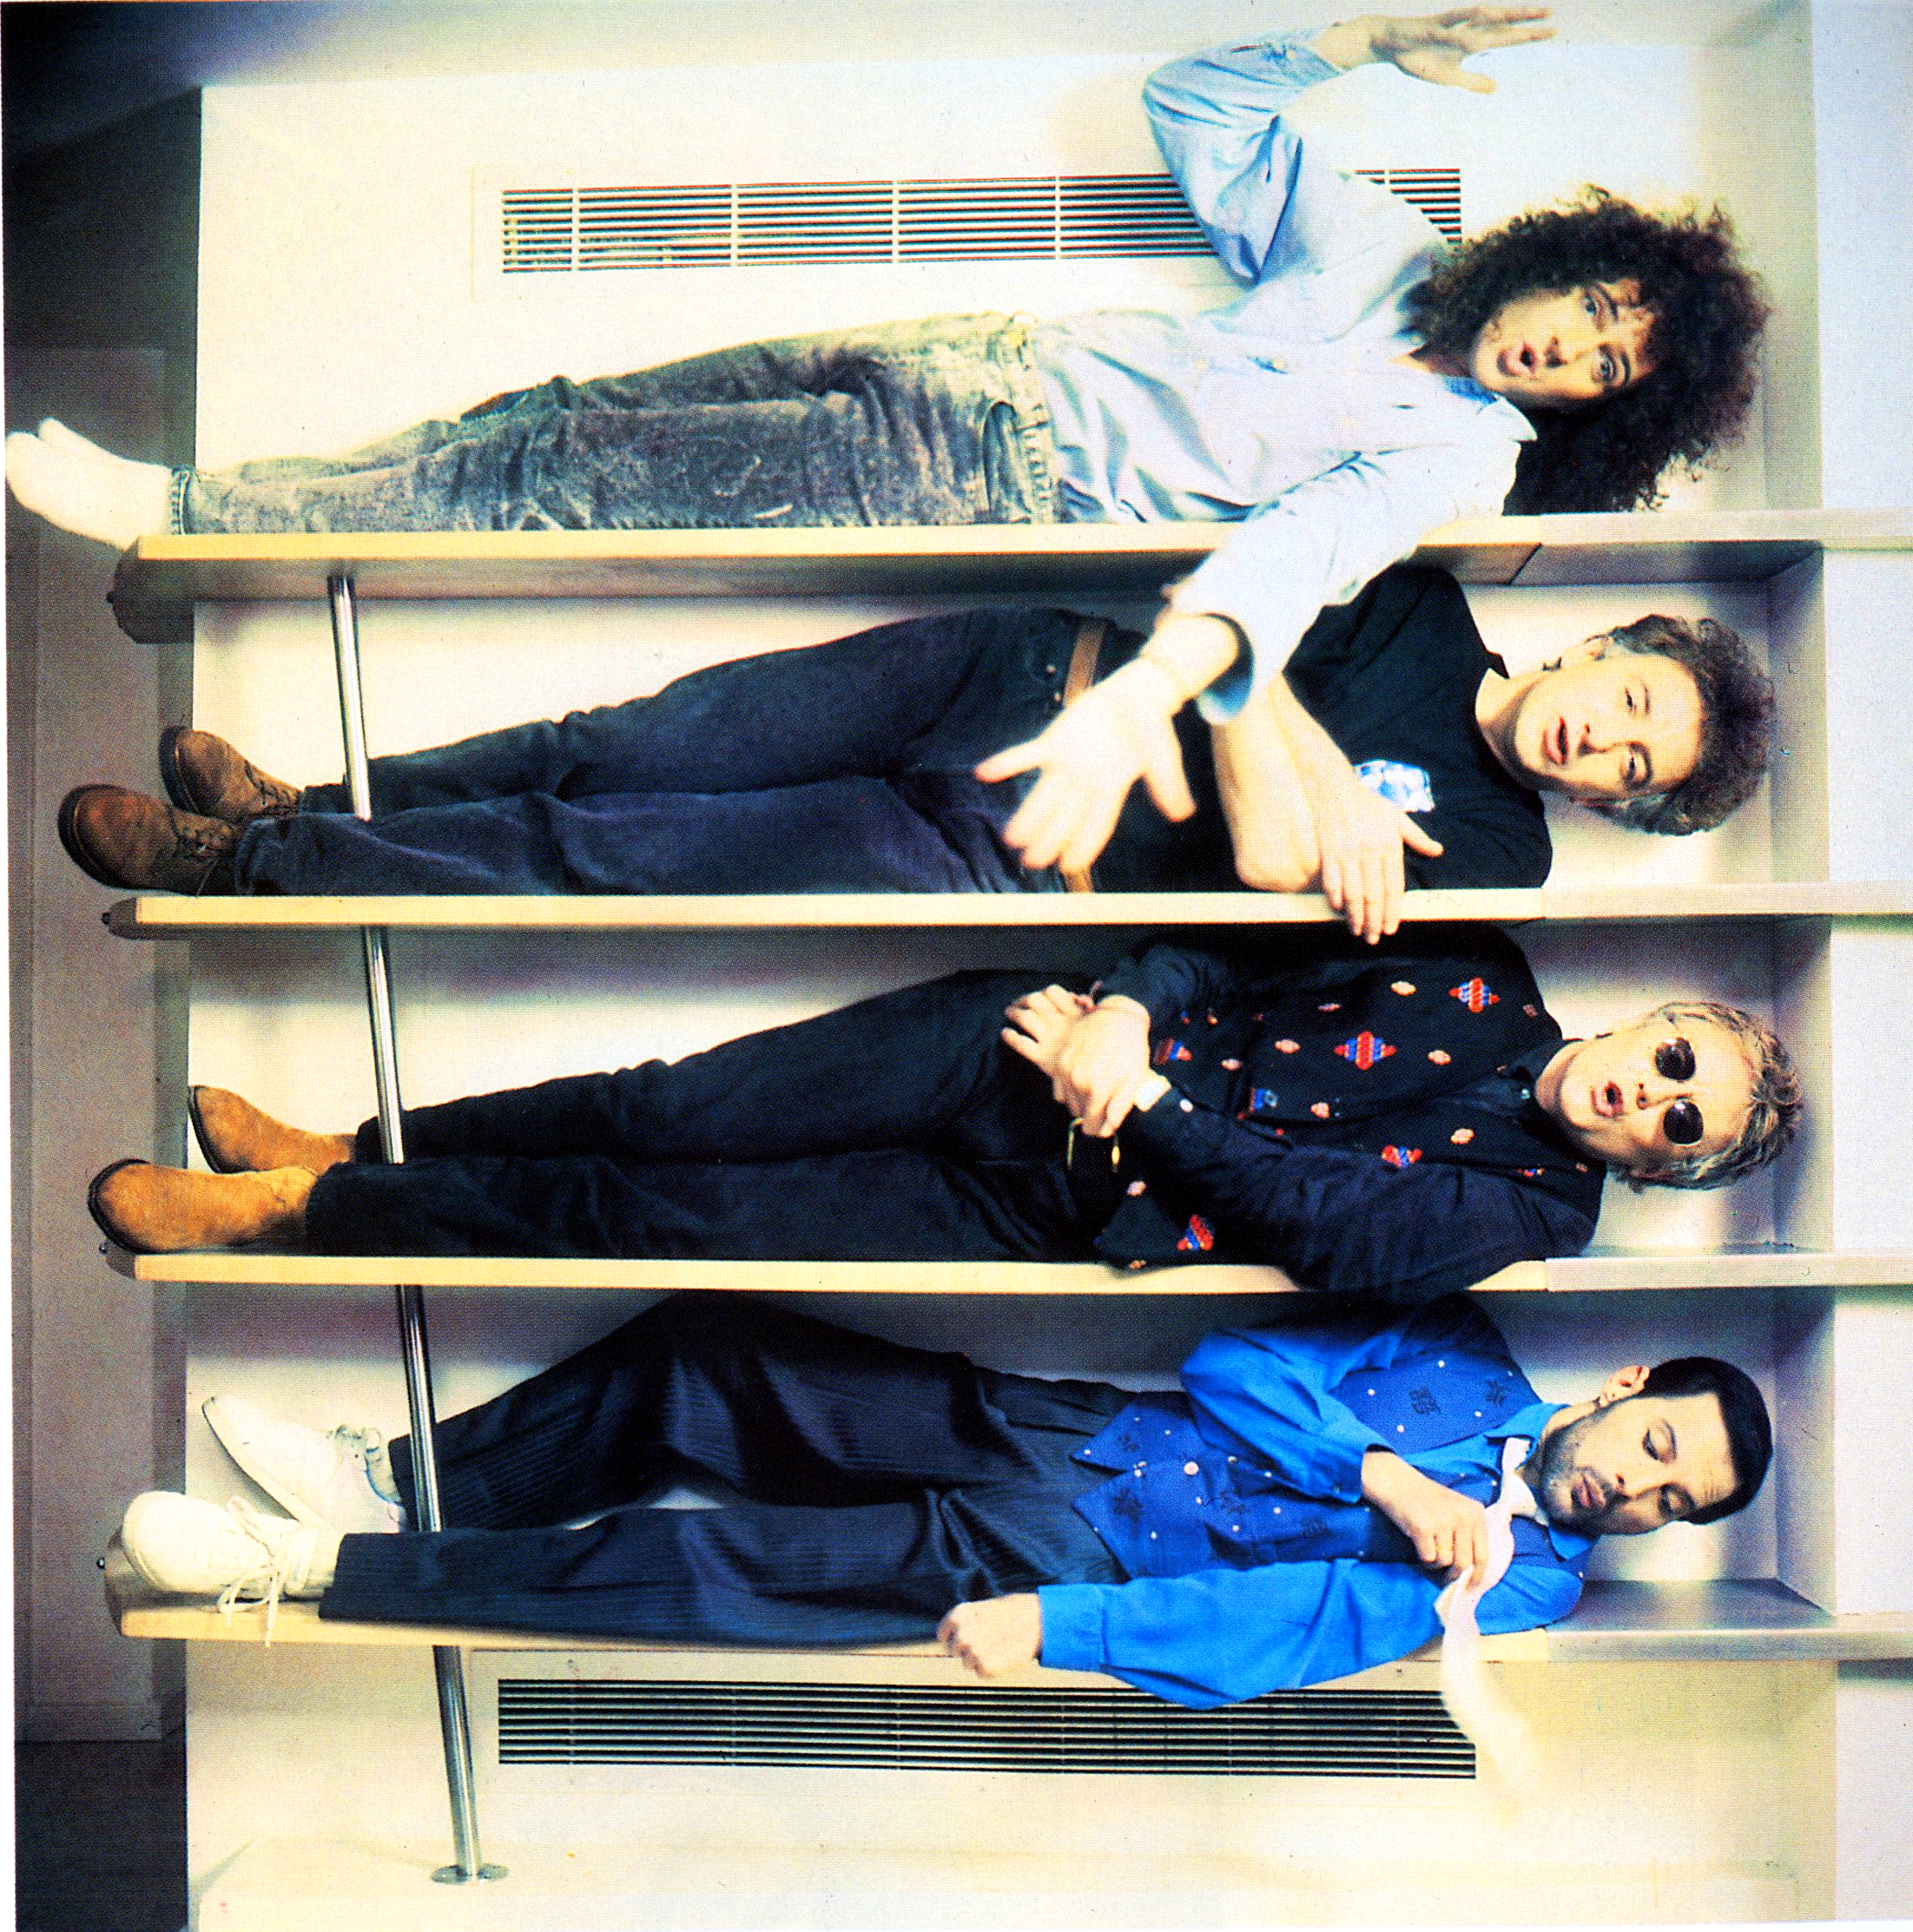 headlong-photo-session-1990.jpg